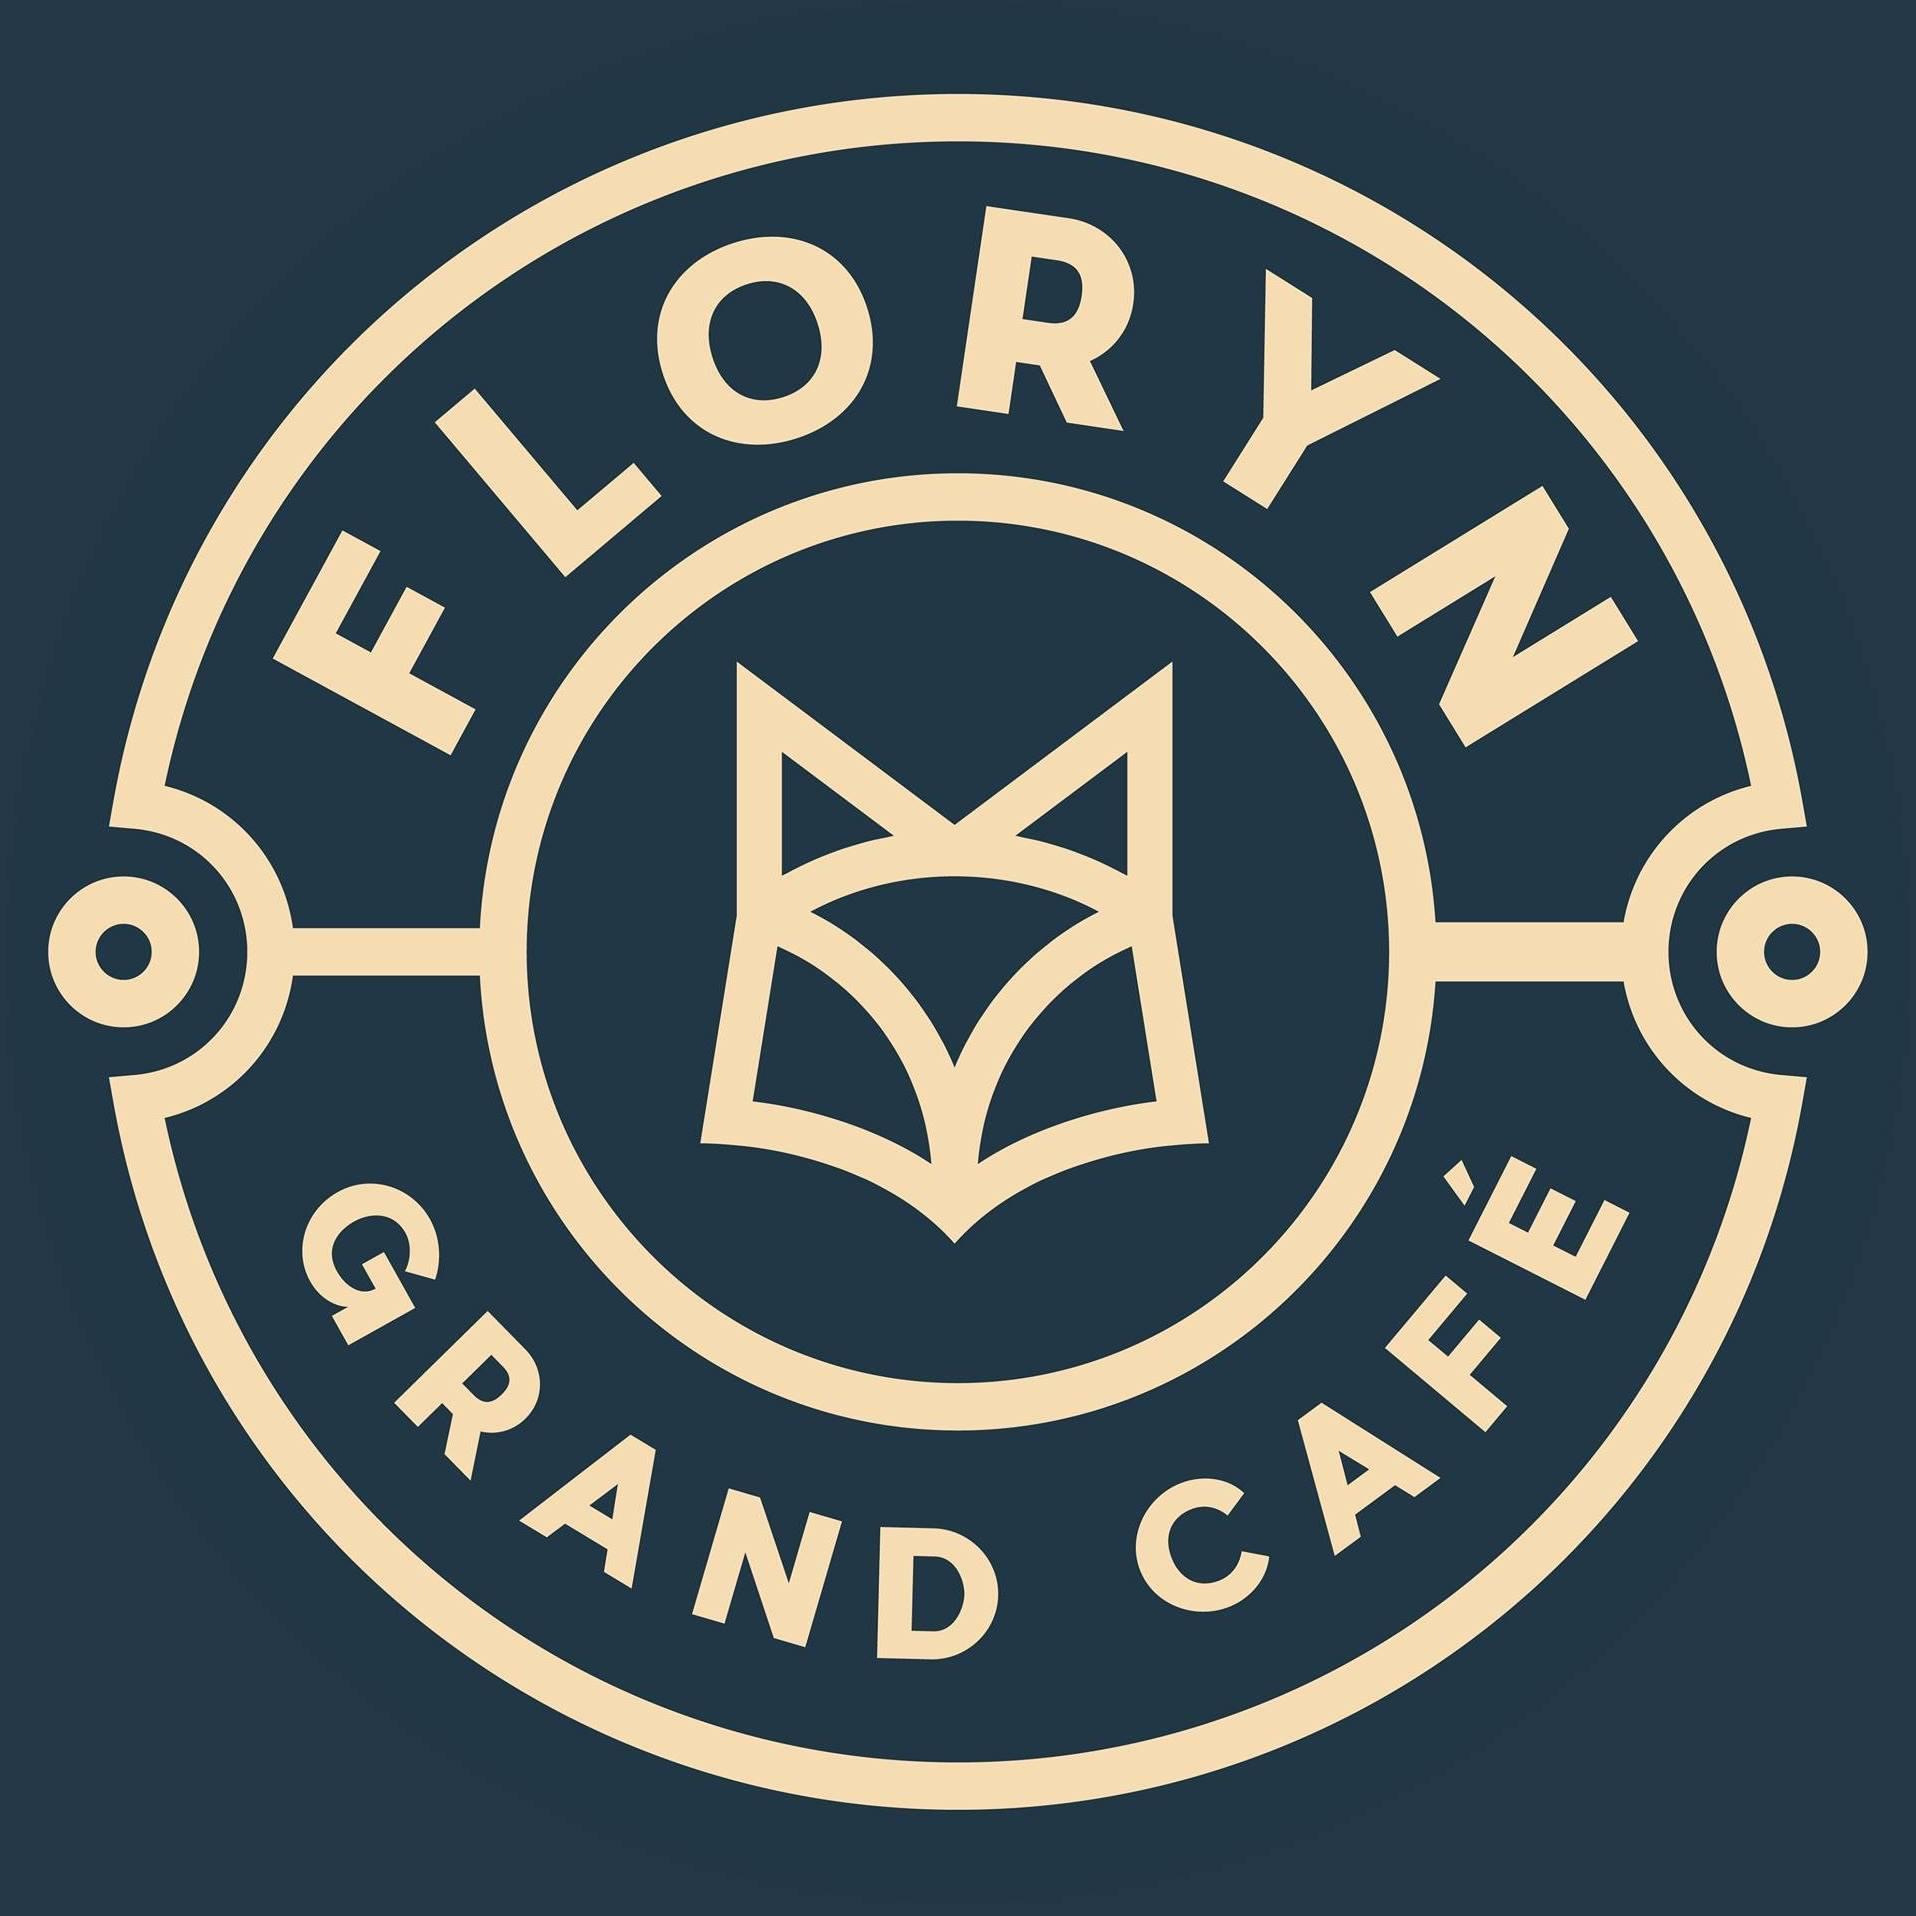 Floryn grand café